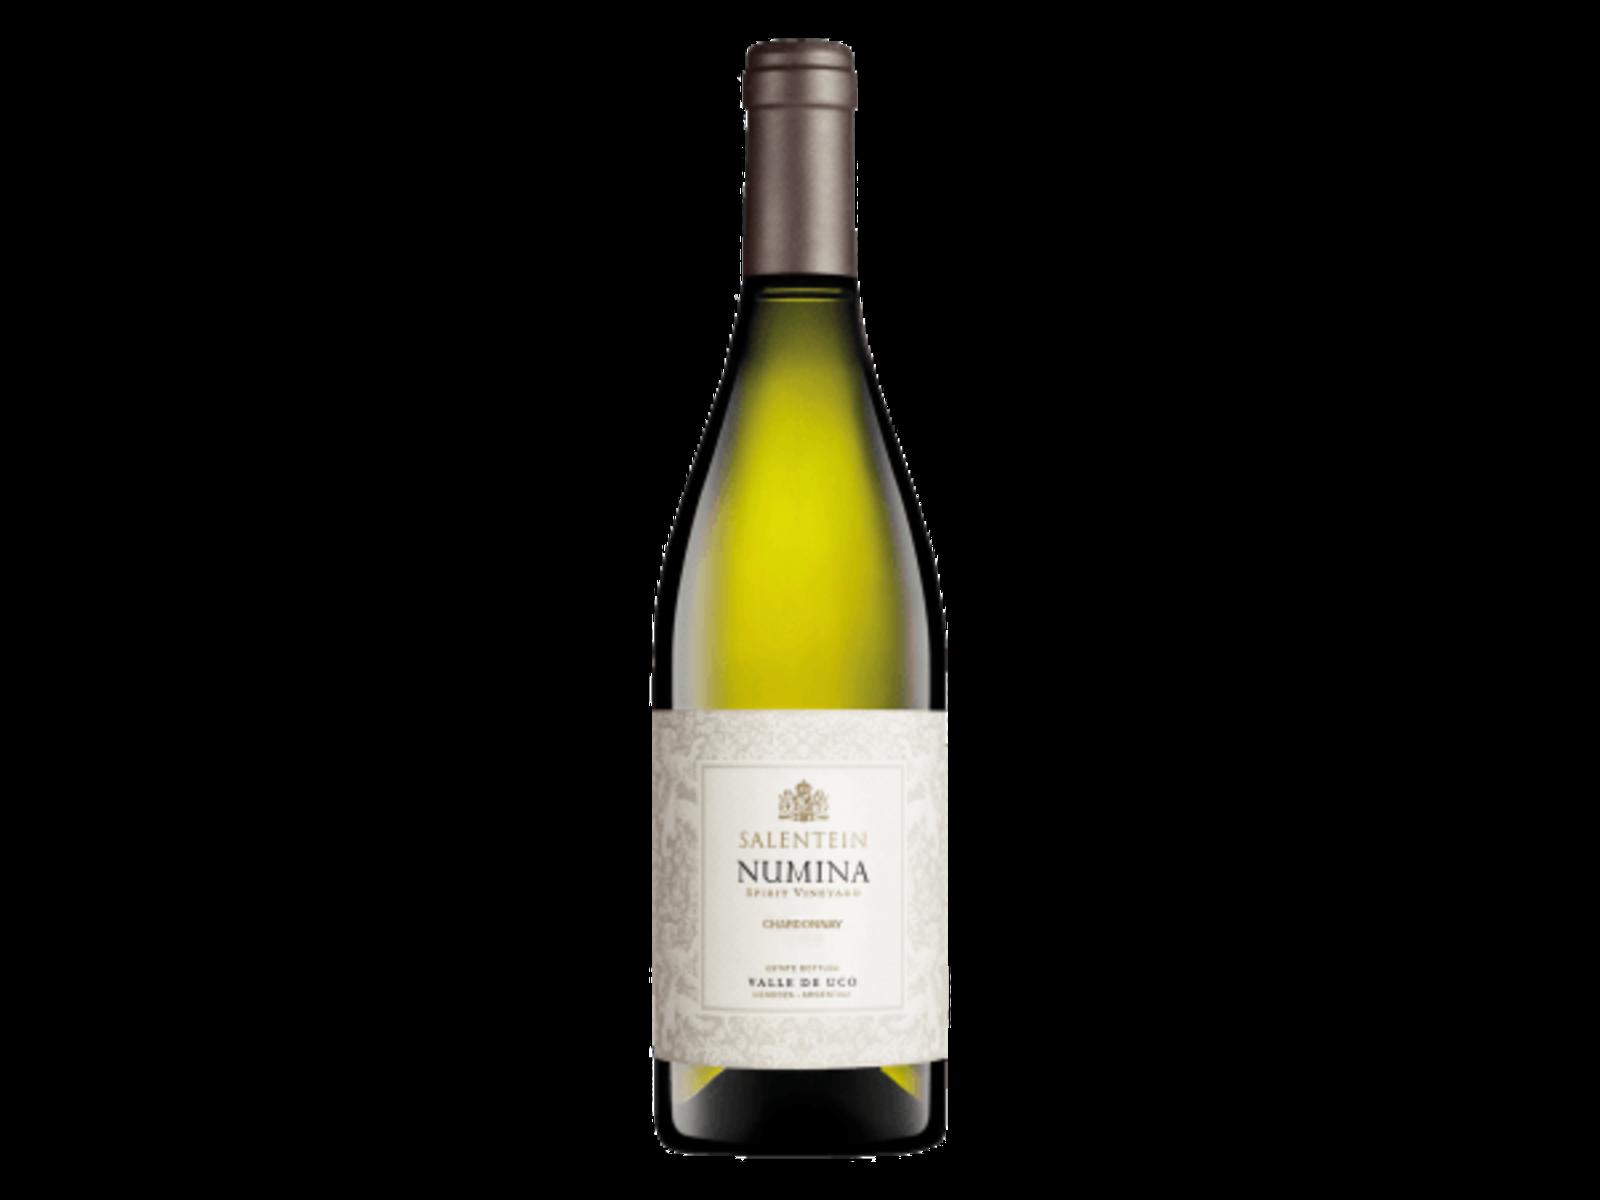 Bodegas Salentein Salentein / Numina / Chardonnay